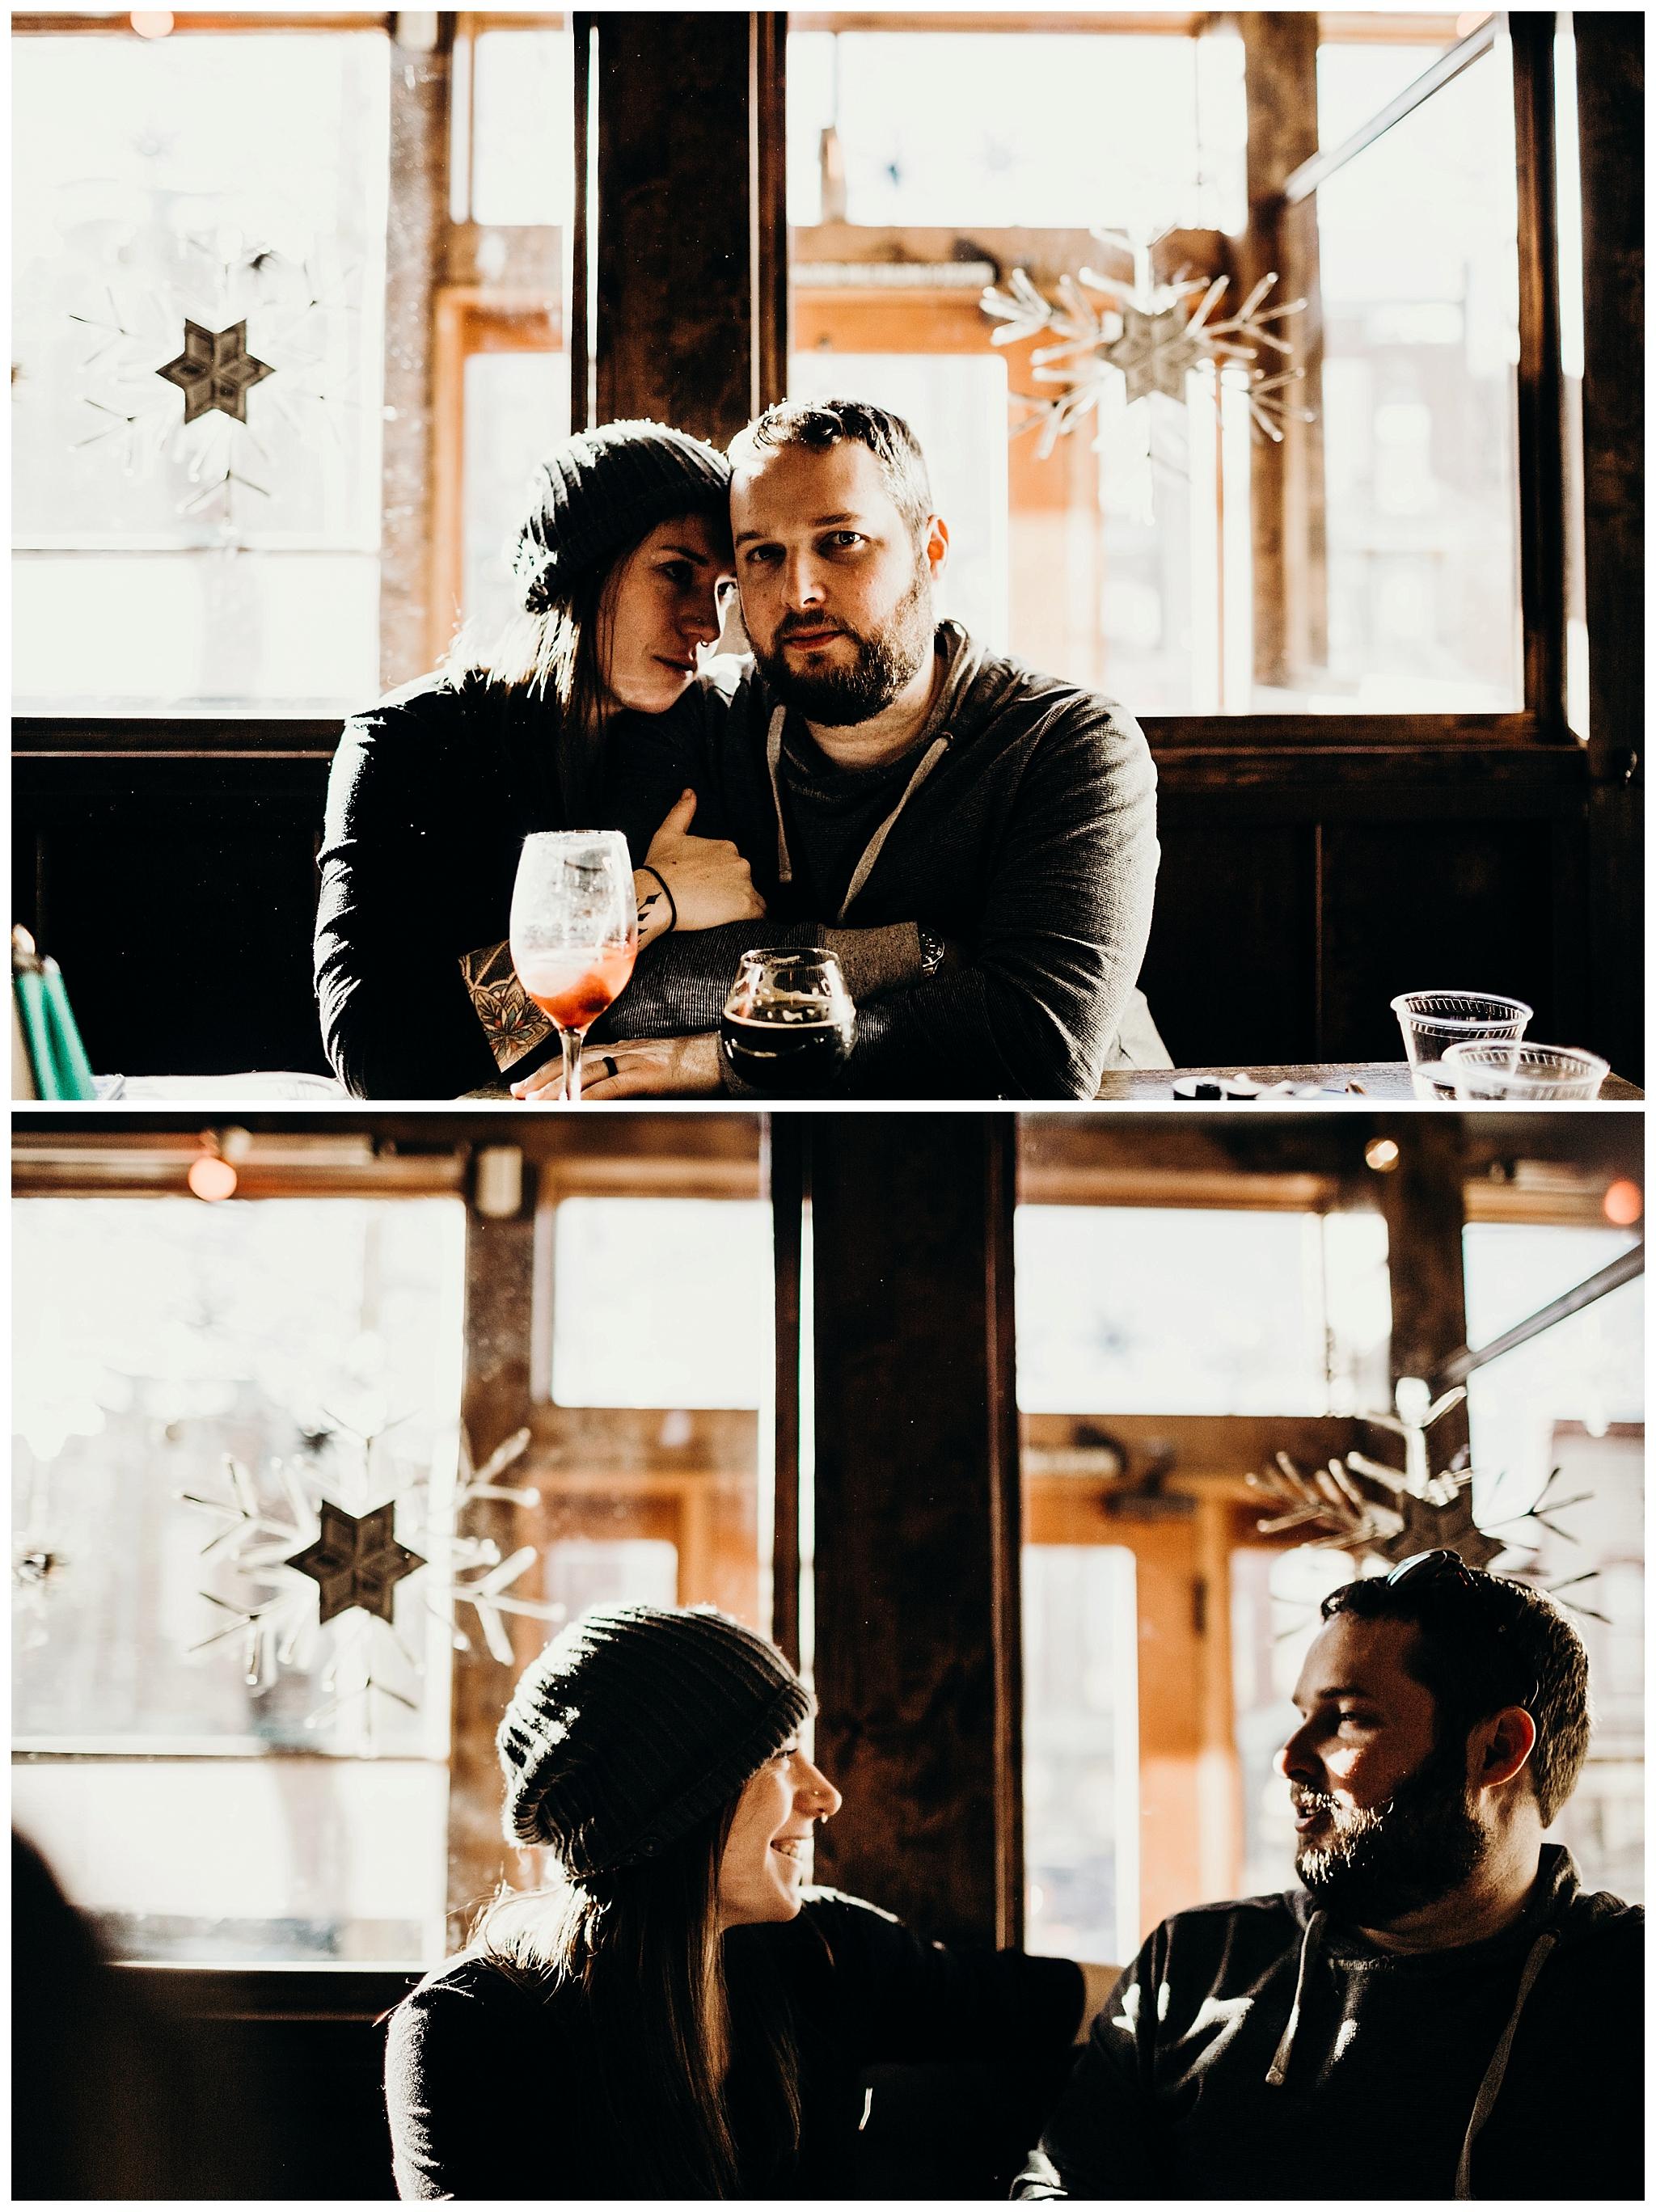 breckenridge-denver-colorado-utah-lifestyle-engagement-elopement-wedding-potographer-4.jpg